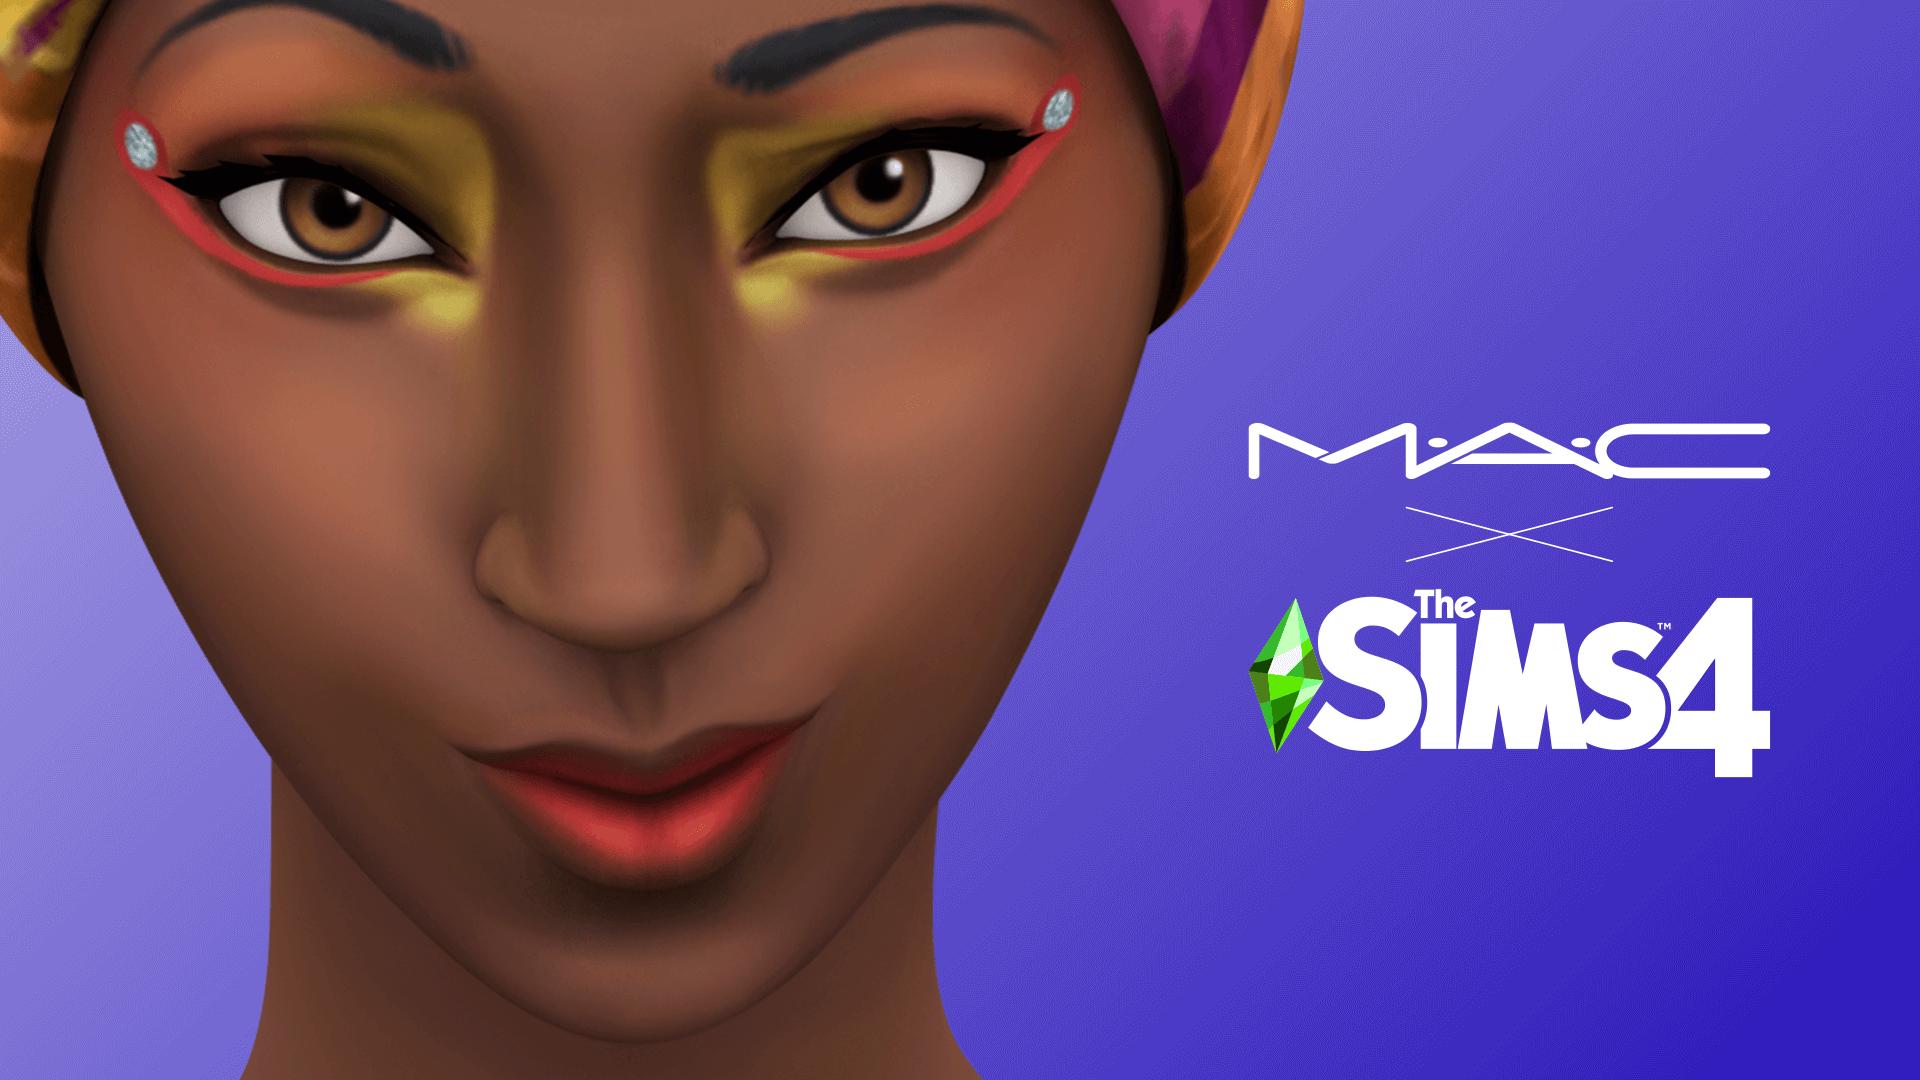 sims4_mac_primary-art_16x9